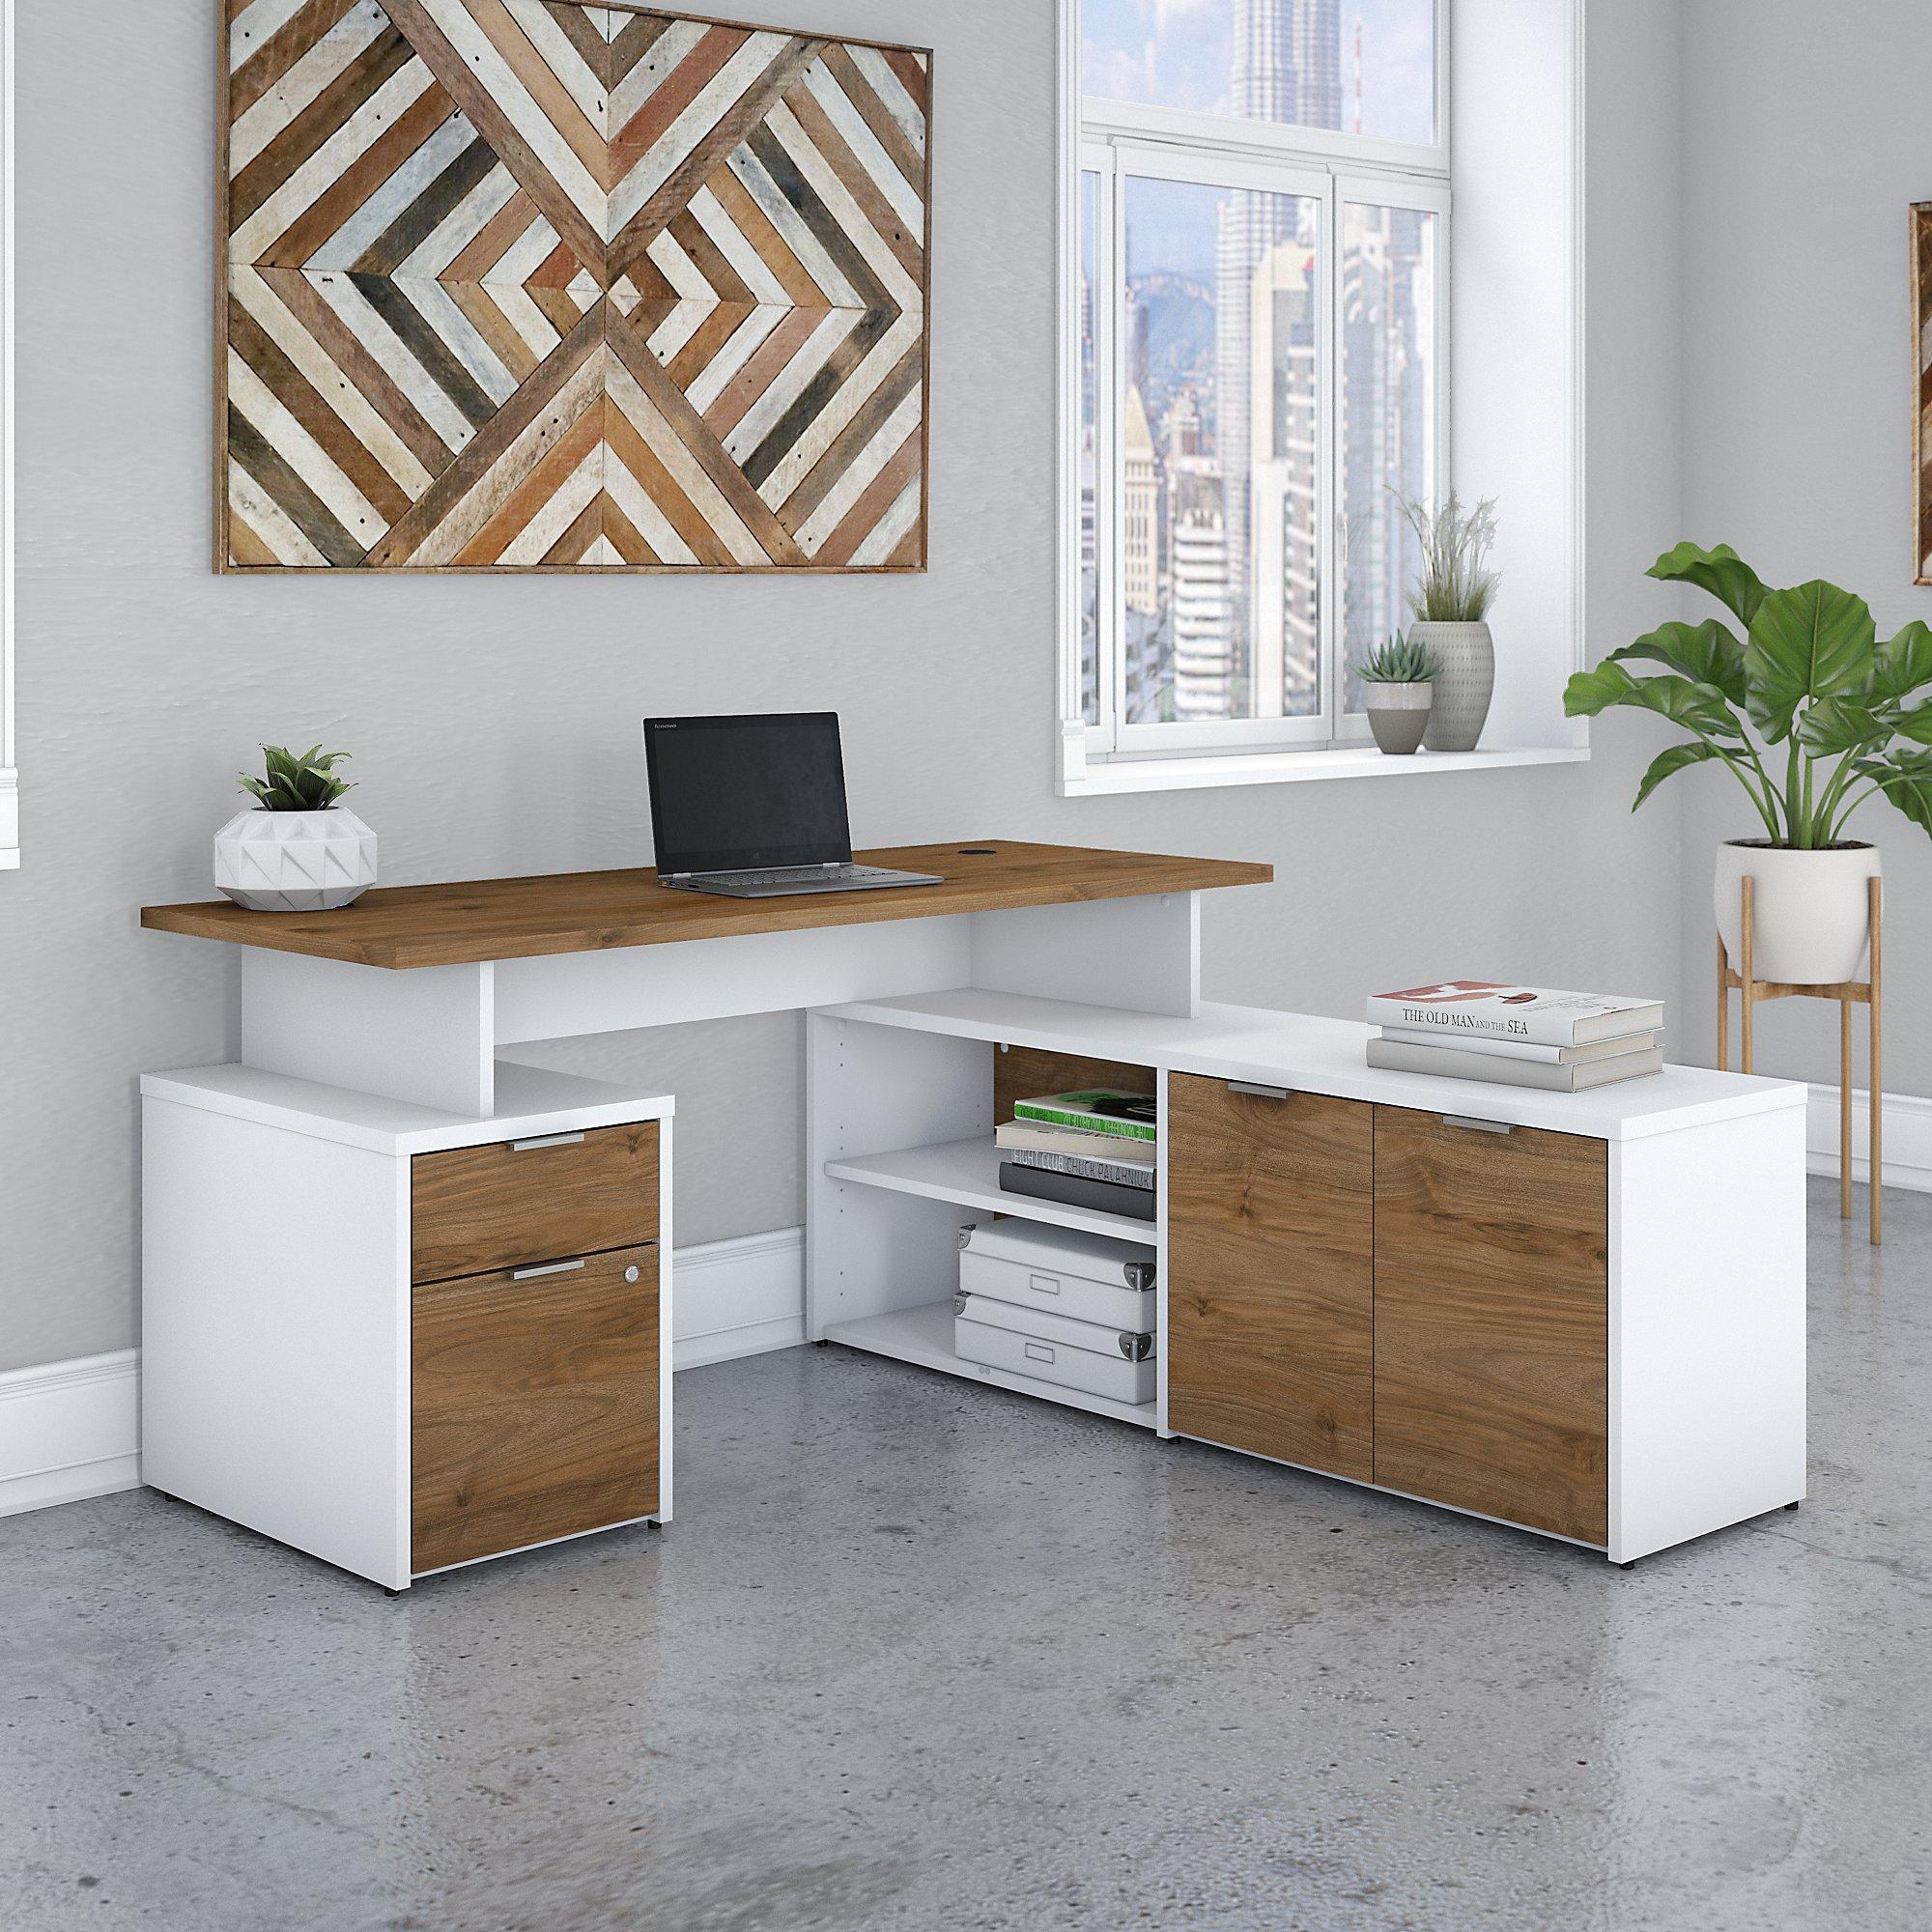 jamestown 60w fresh walnut and white l-shaped desk